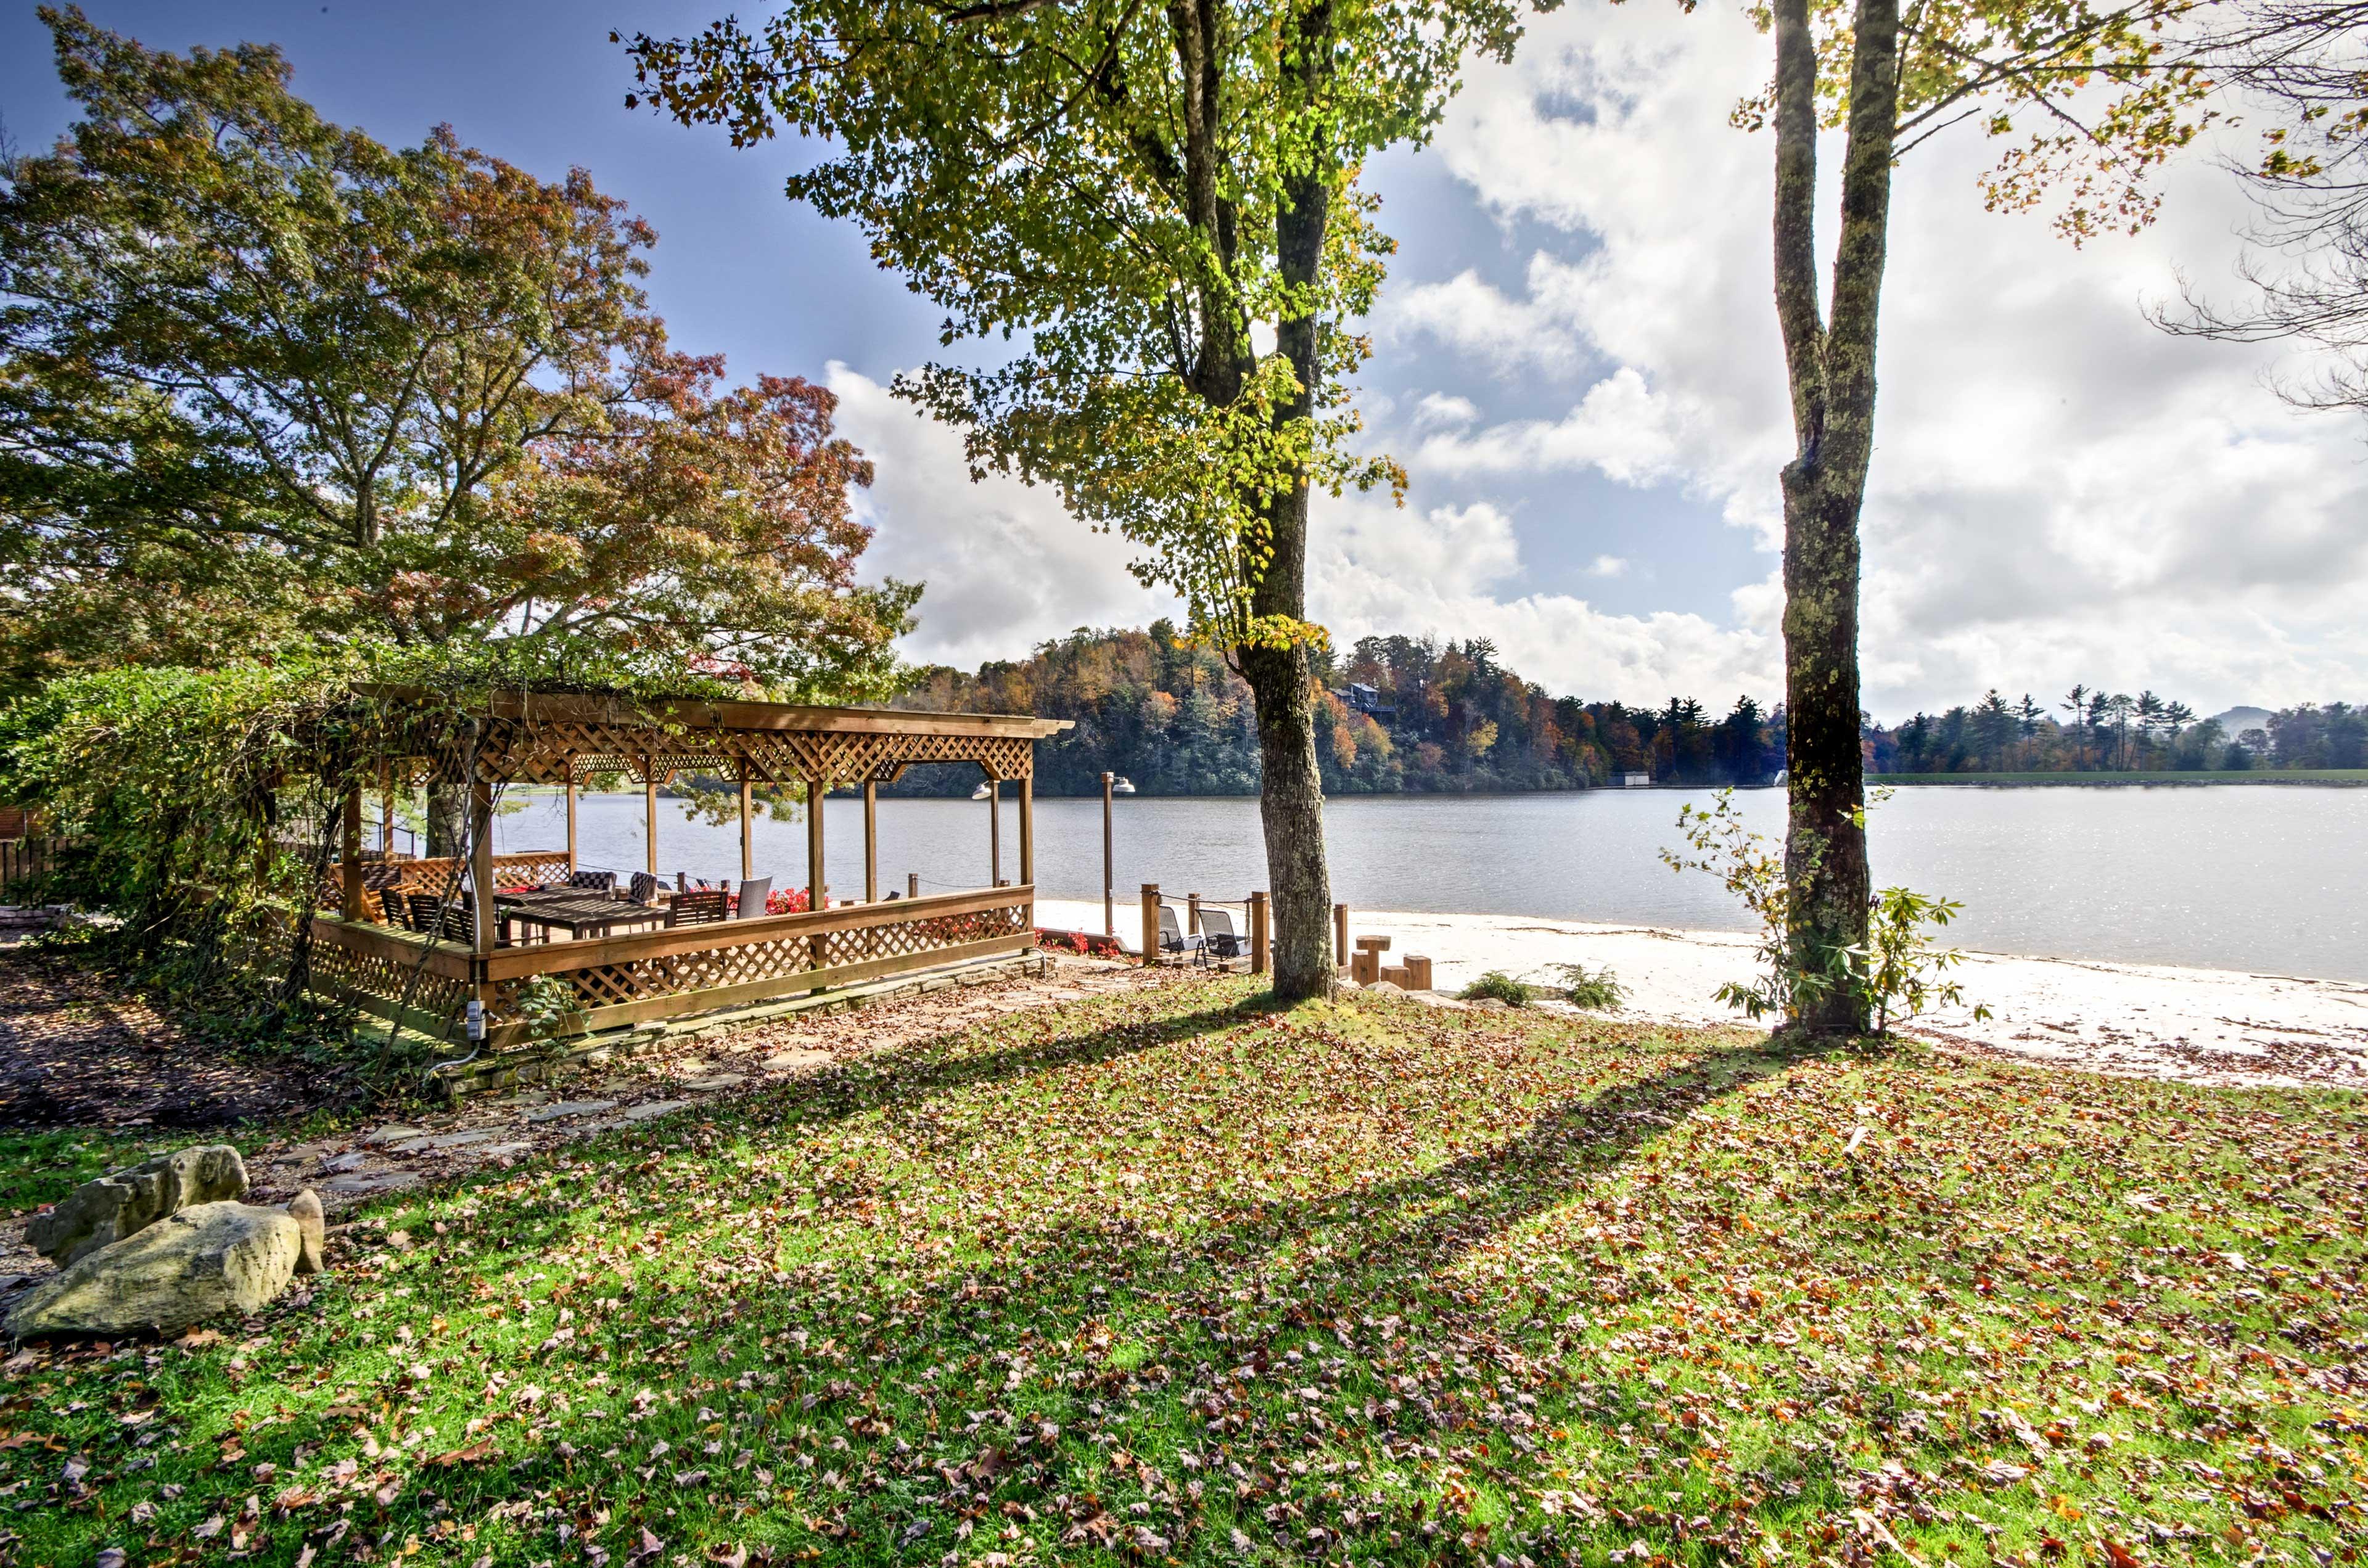 Lake and River Access